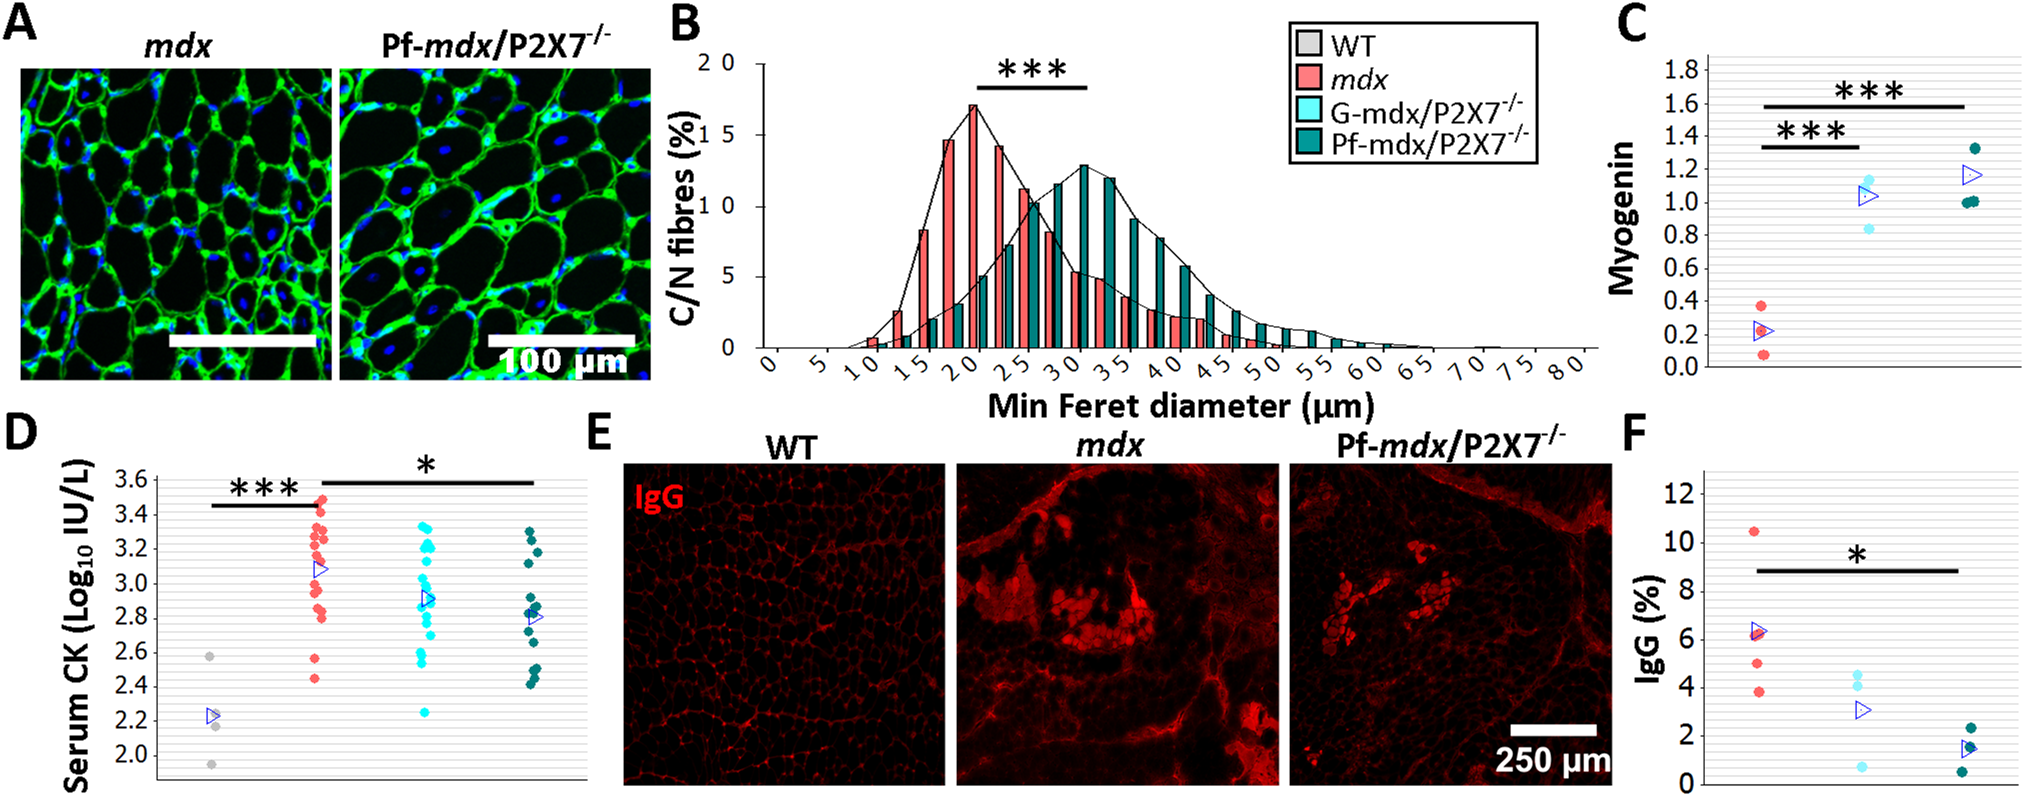 P2RX7 ablation reduces <i>mdx</i> mouse muscle pathology.